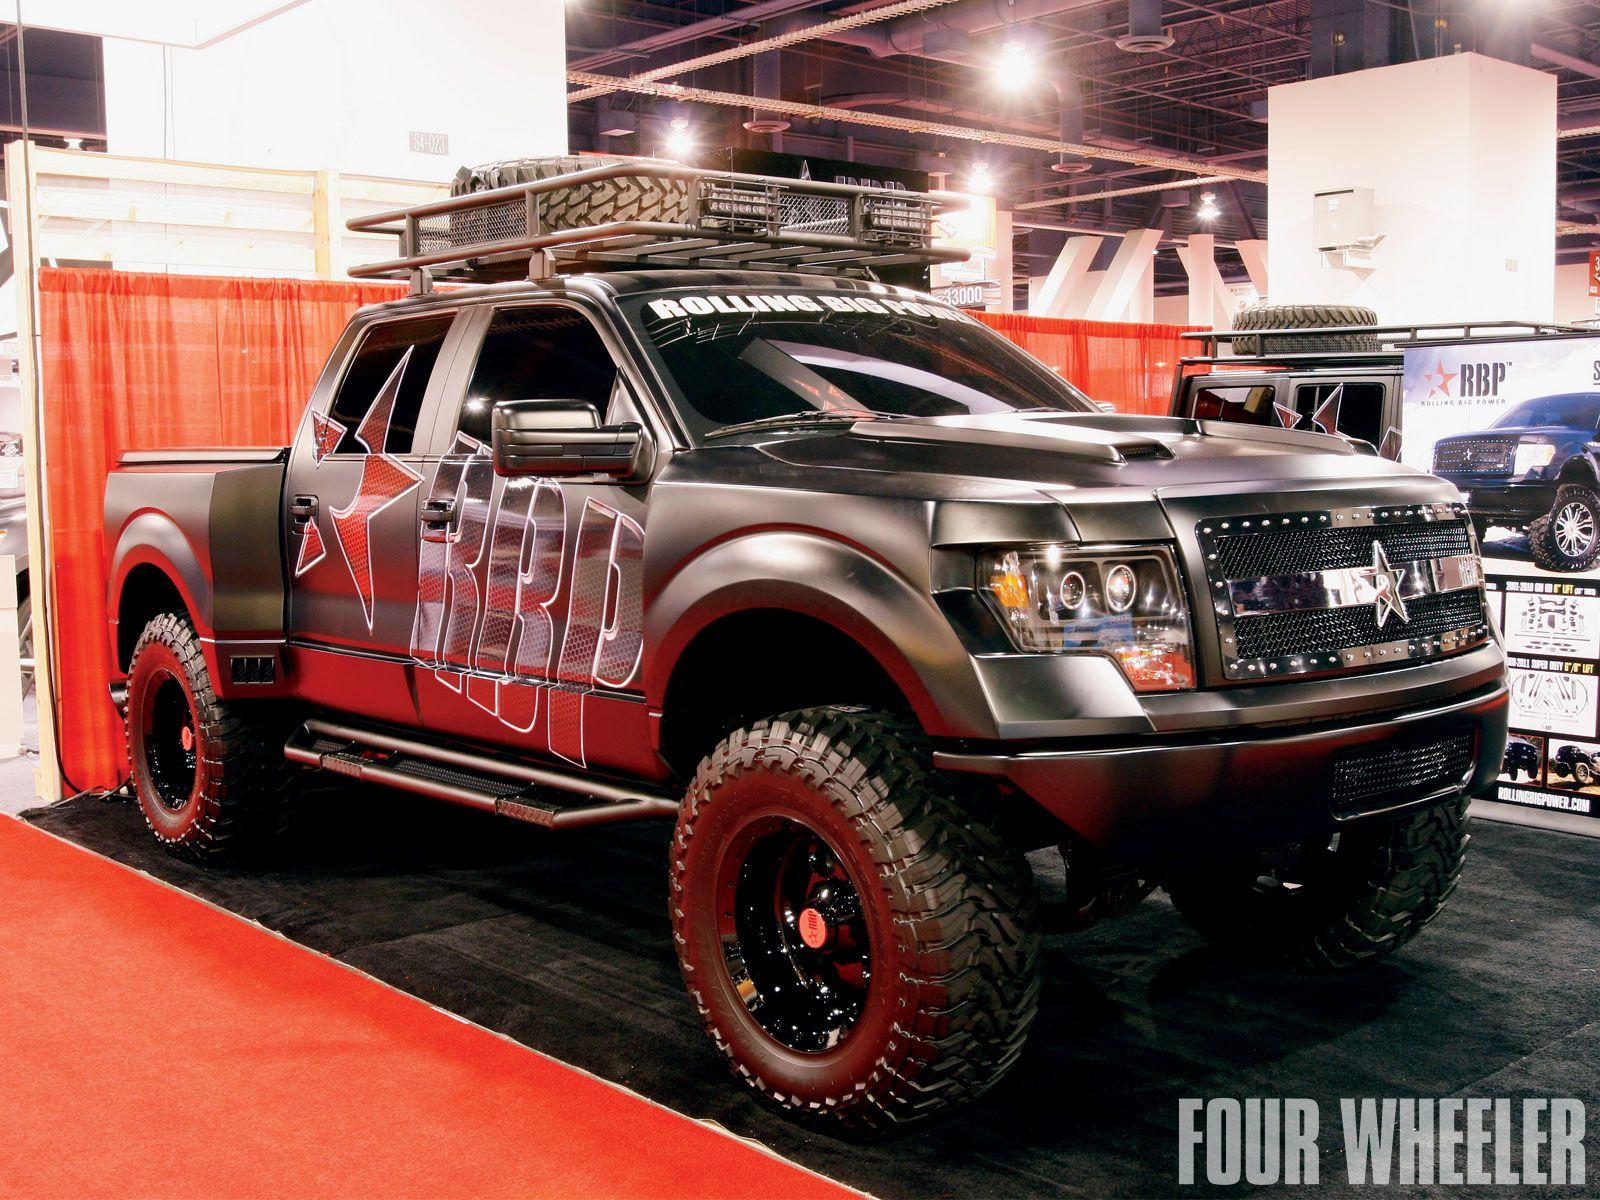 Ford F 150 Roof Rack Bushwacker Google Search Off Road Rides Ford 4x4 Ford Trucks Trucks